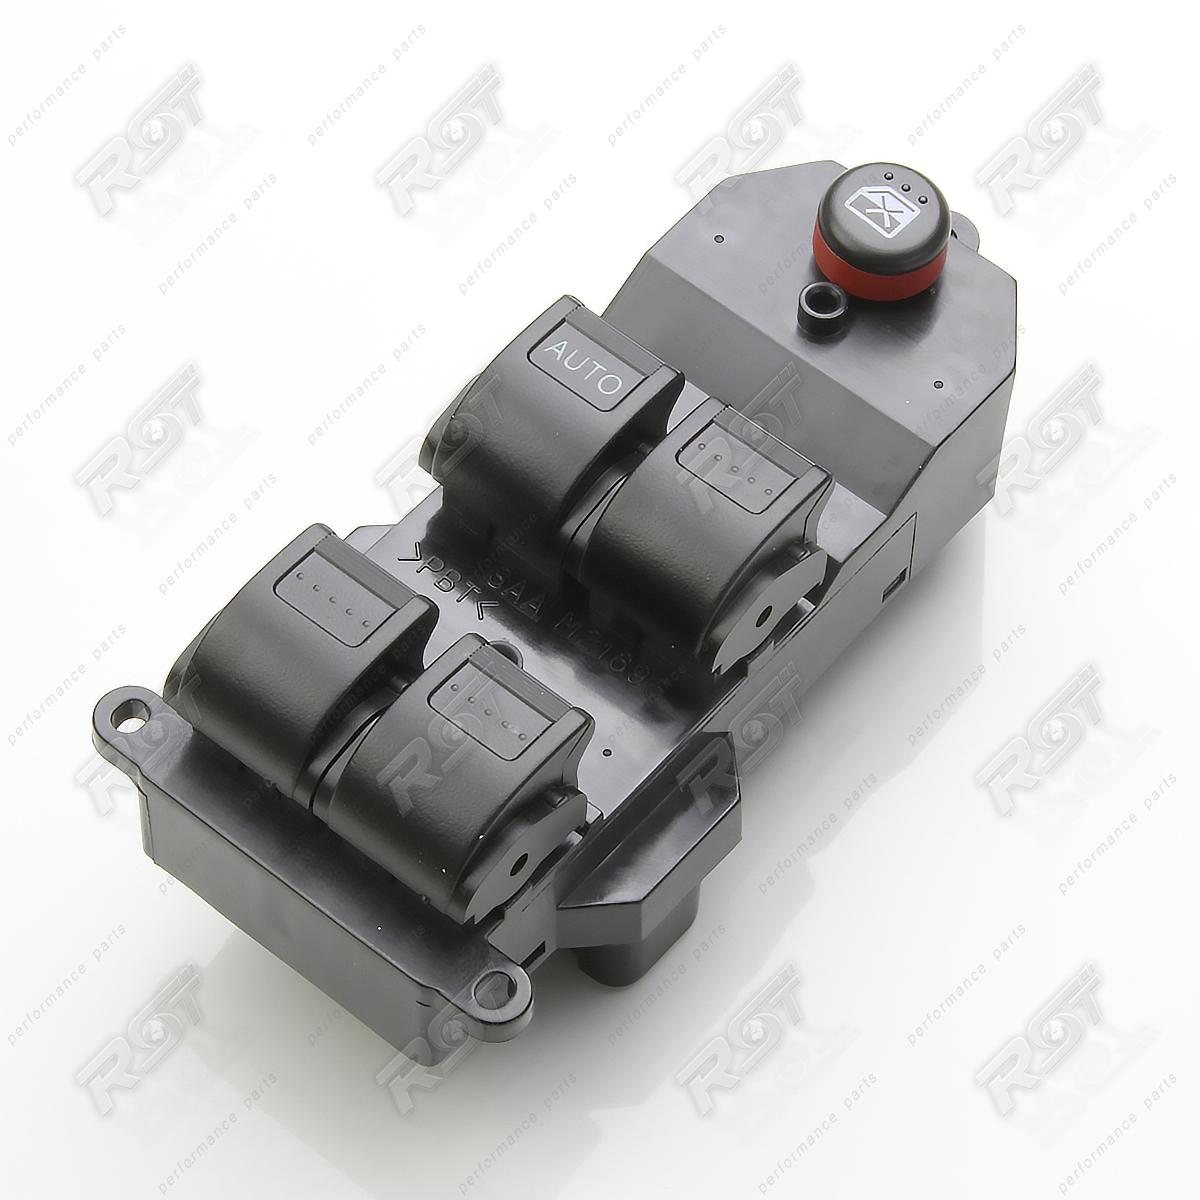 Electric winow regulator switch 5 kn pfe left for honda for 2001 crv window regulator